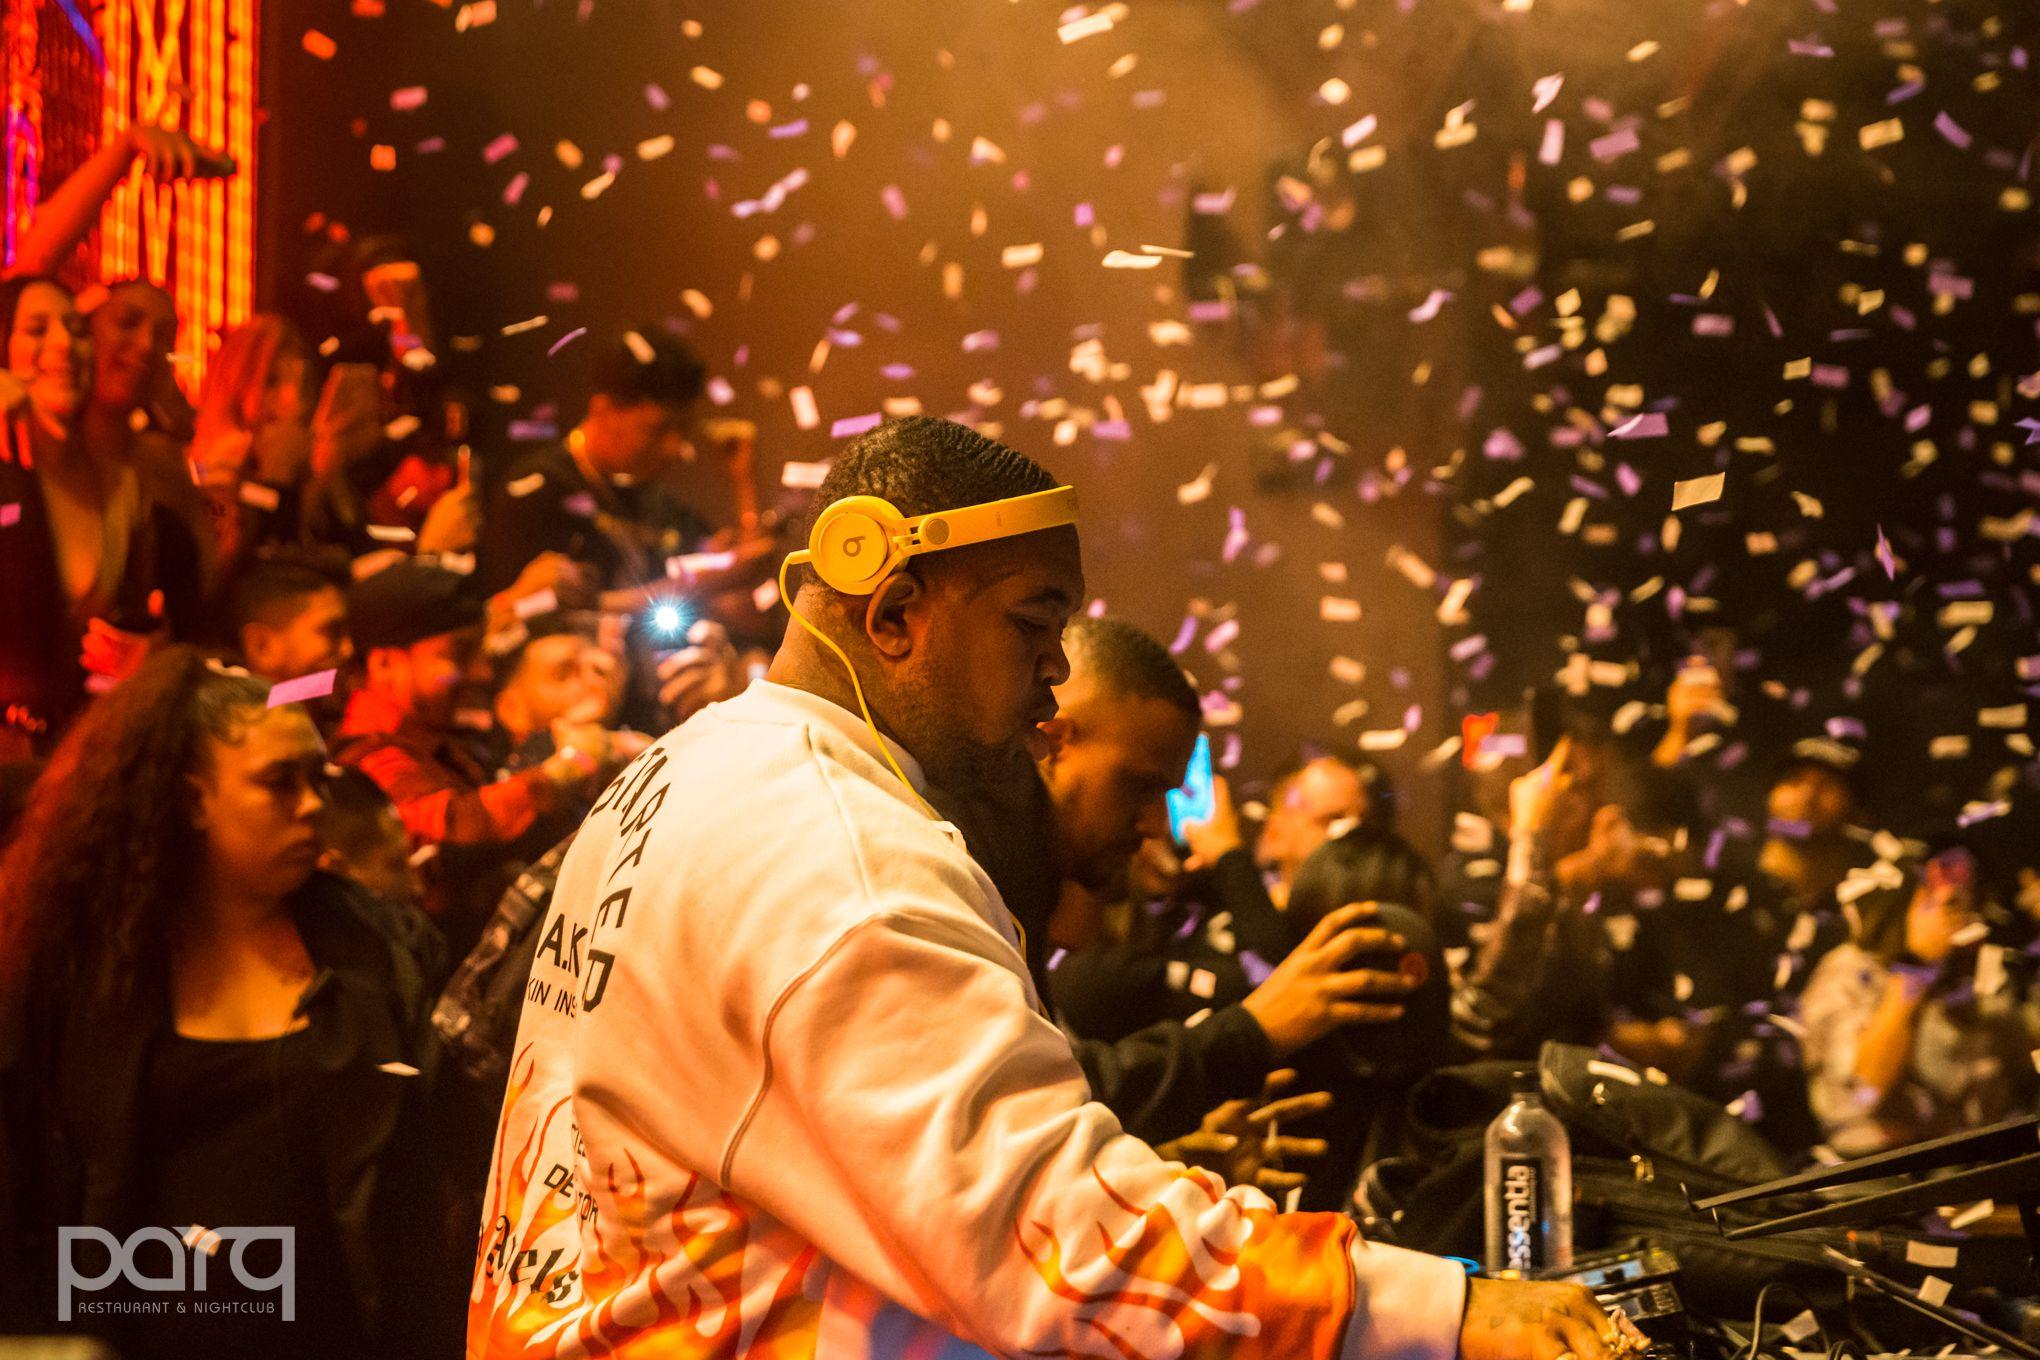 11.27.19 Parq - DJ Mustard-22.jpg